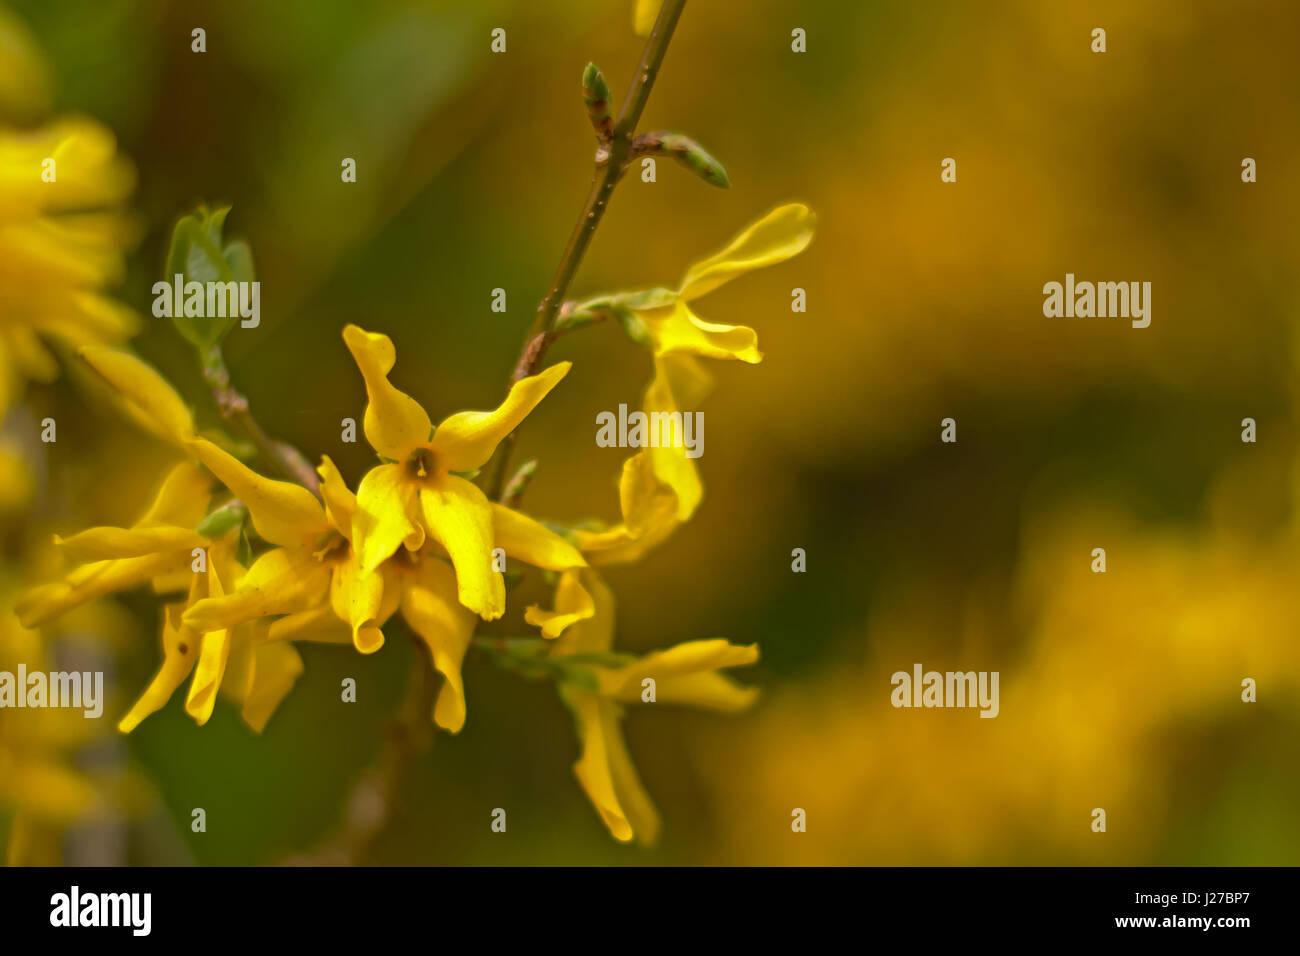 Bright yellow forsythia flowers, selective focus Stock Photo